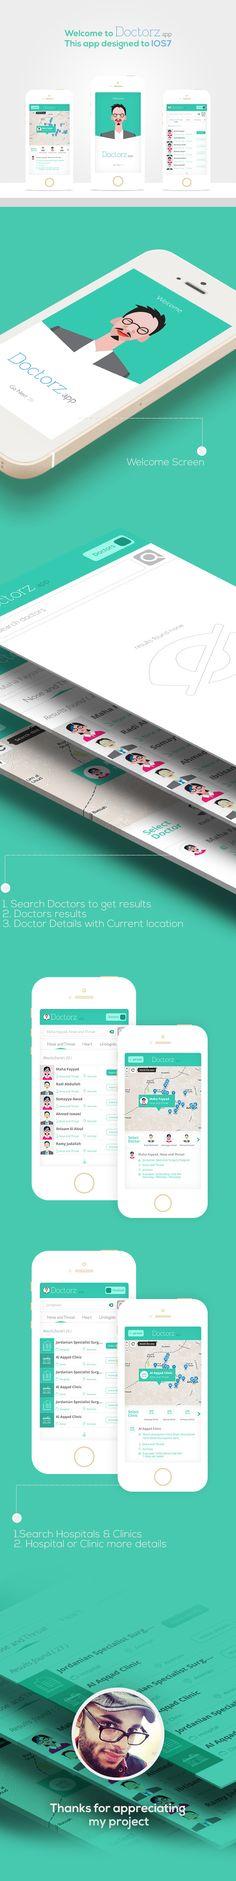 Doctorz Mobile app by AlHasan AlDasooqi